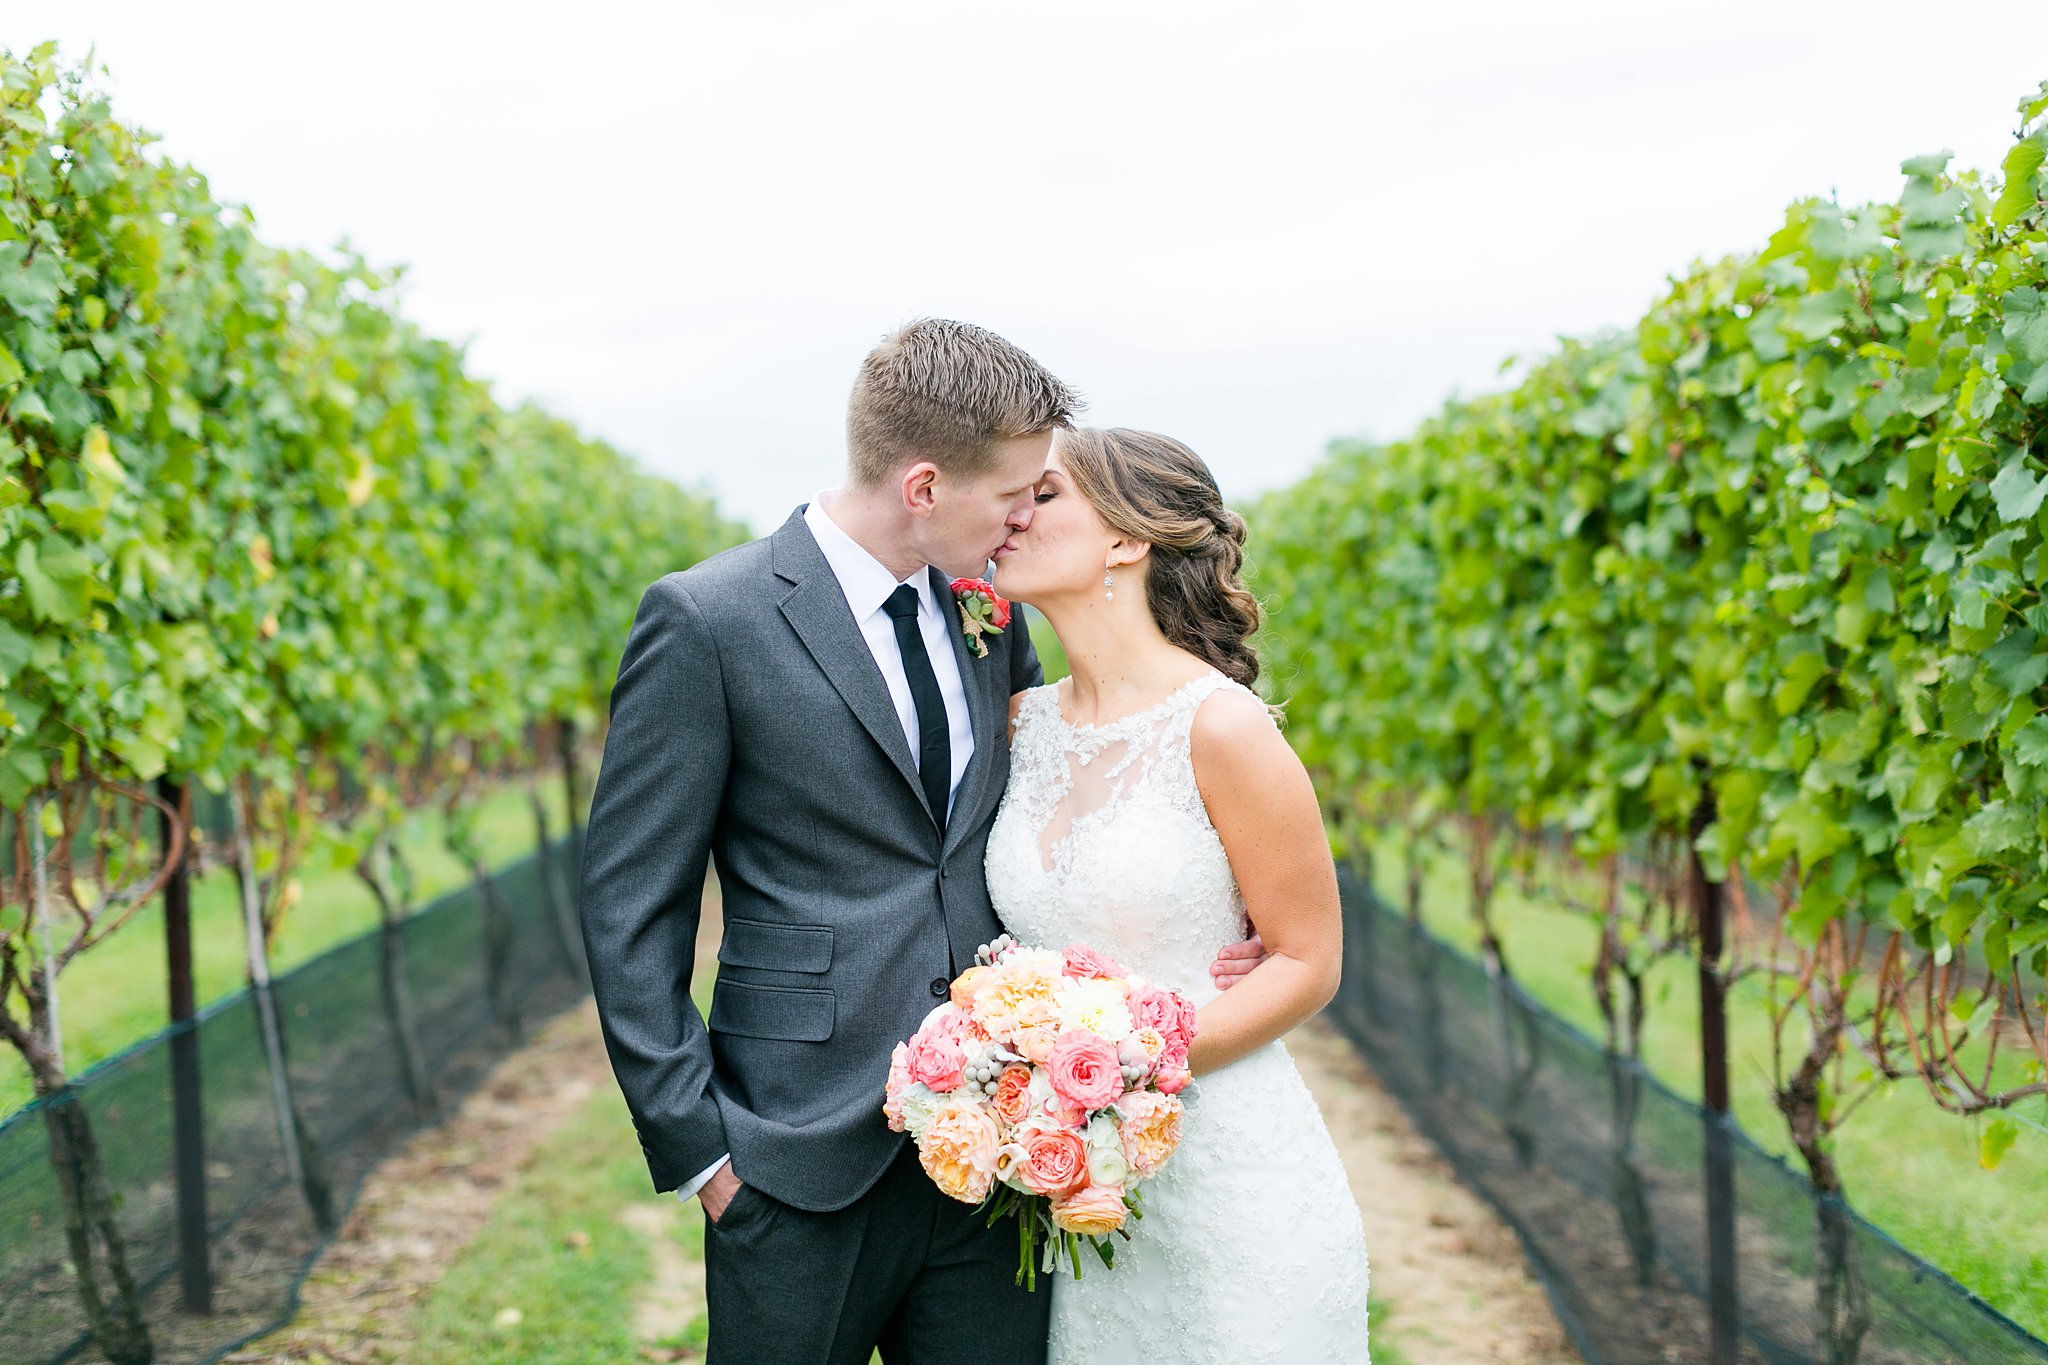 Stone Tower Winery Wedding Photos Virginia Wedding Photographer Megan Kelsey Photography Sam & Angela-211.jpg